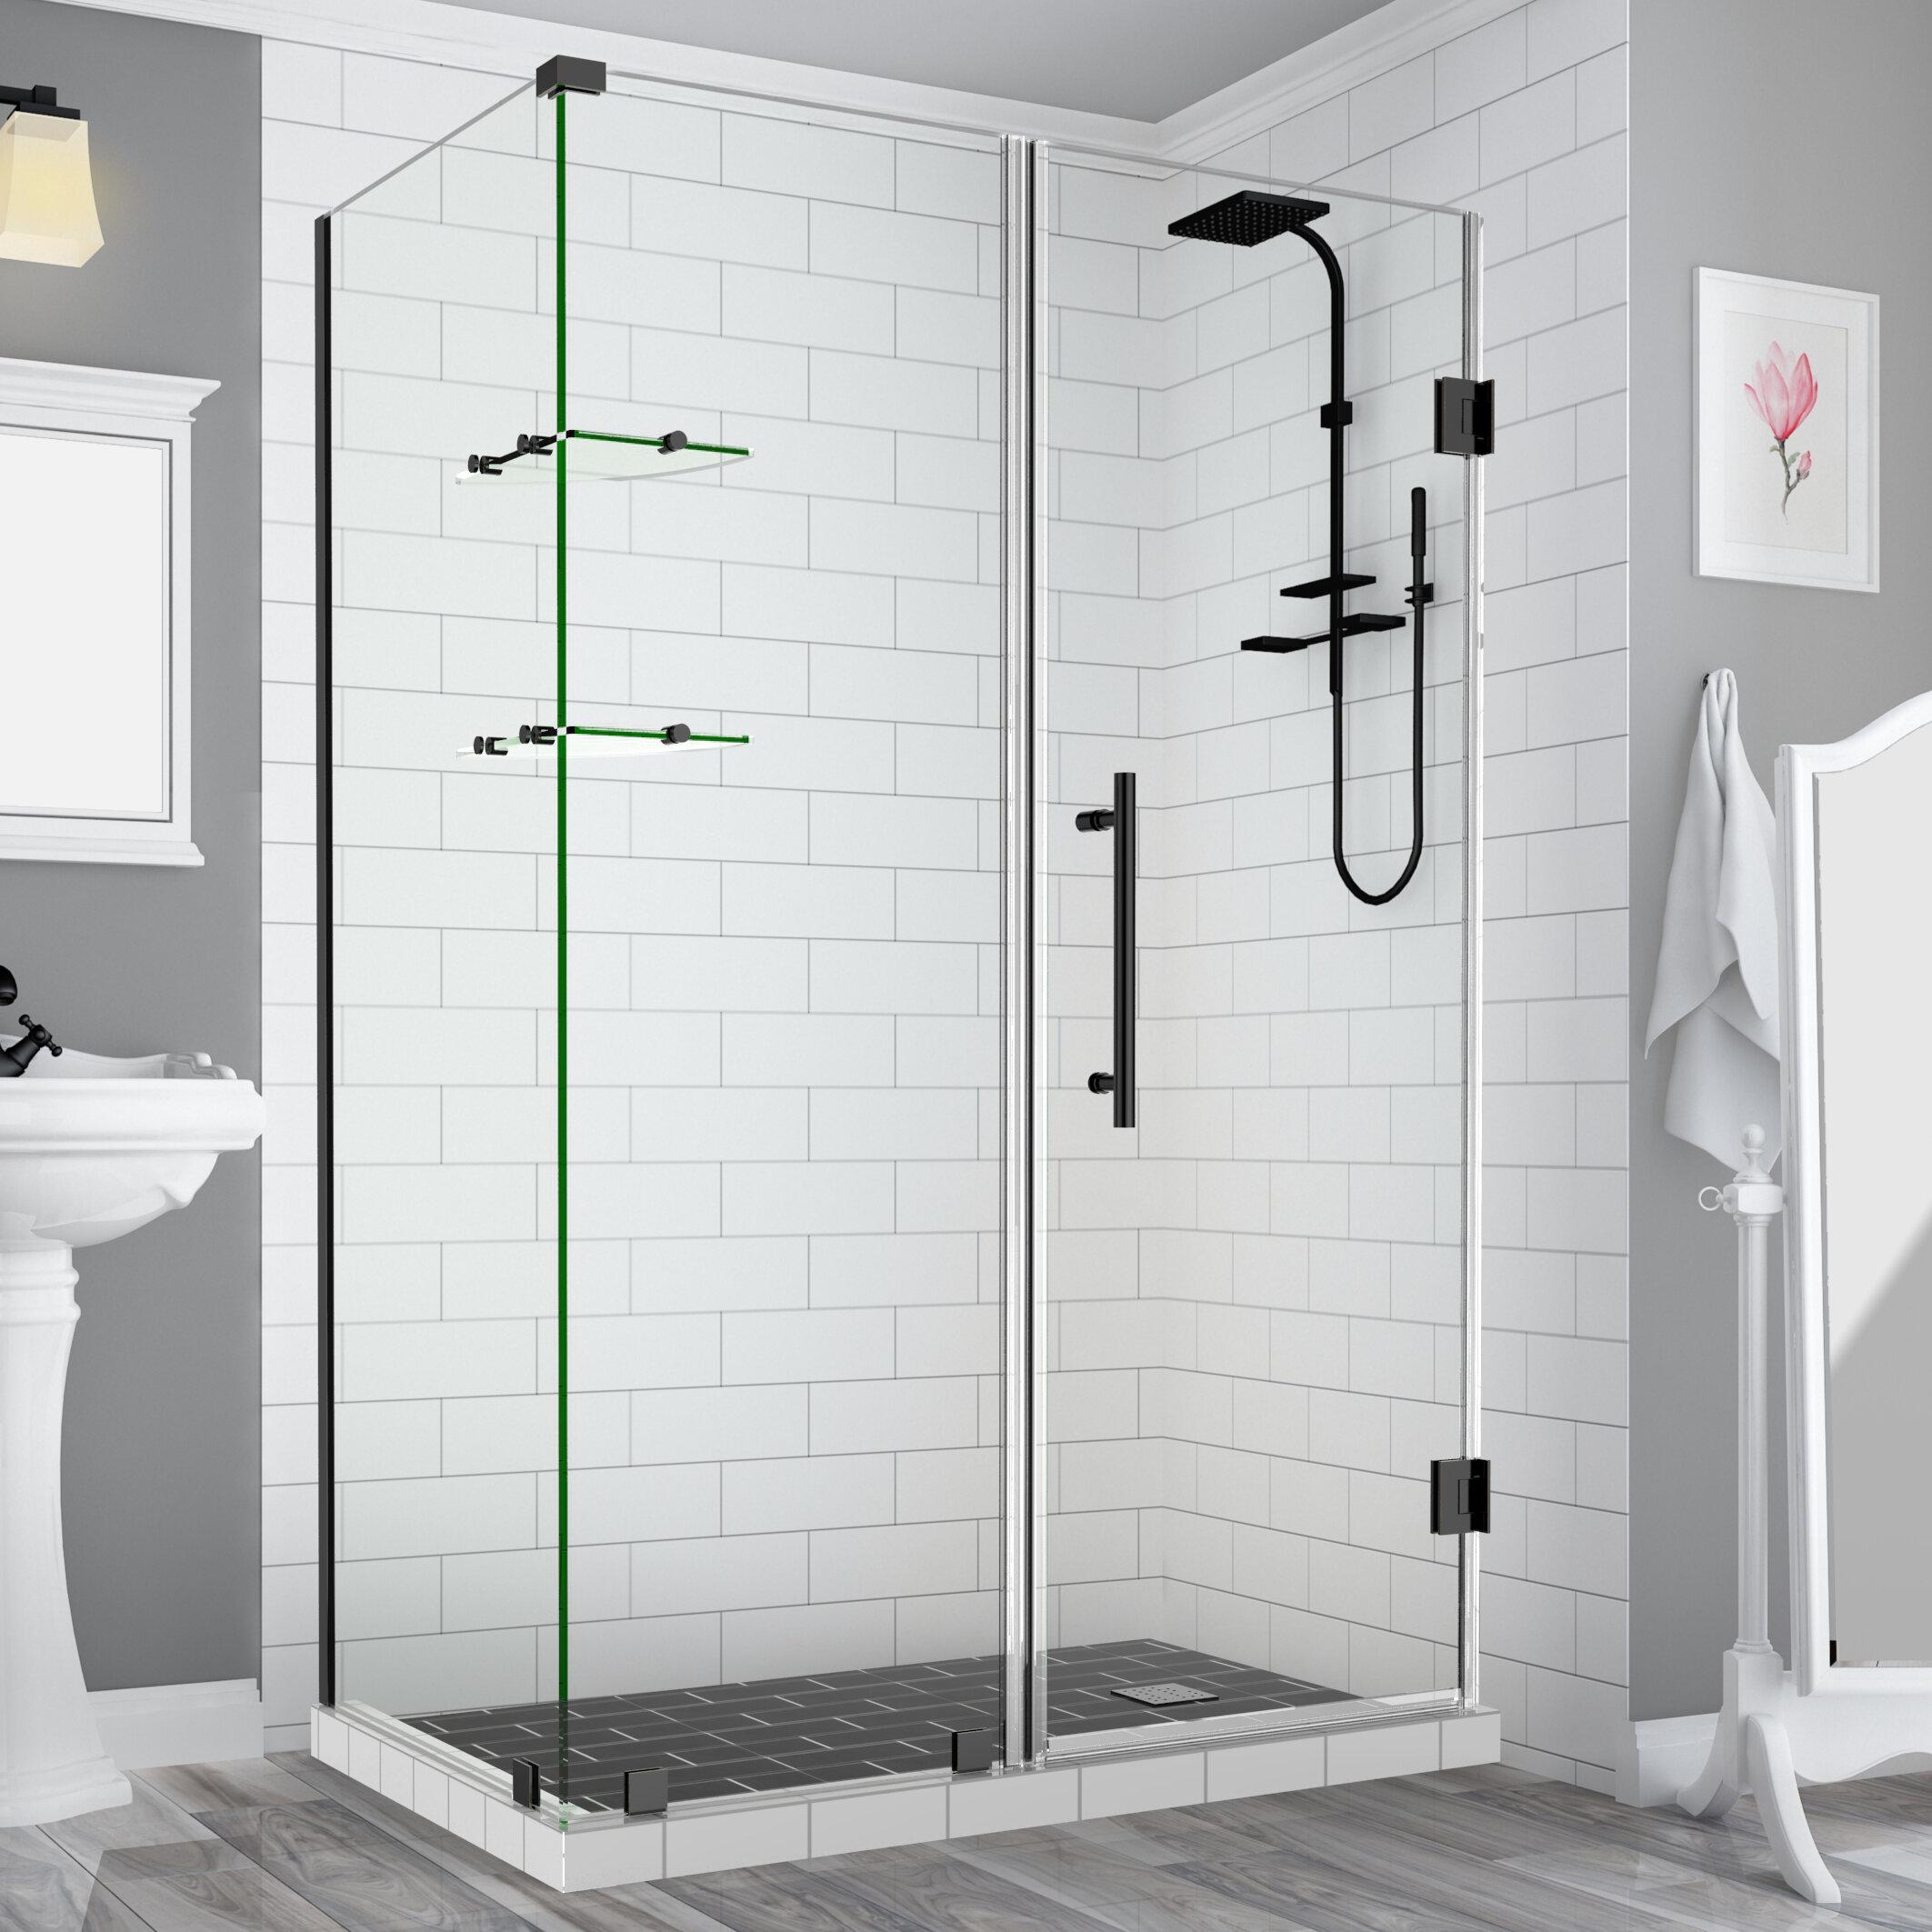 Aston Bromley Gs 32 X 72 Rectangle Hinged Shower Enclosure Wayfair